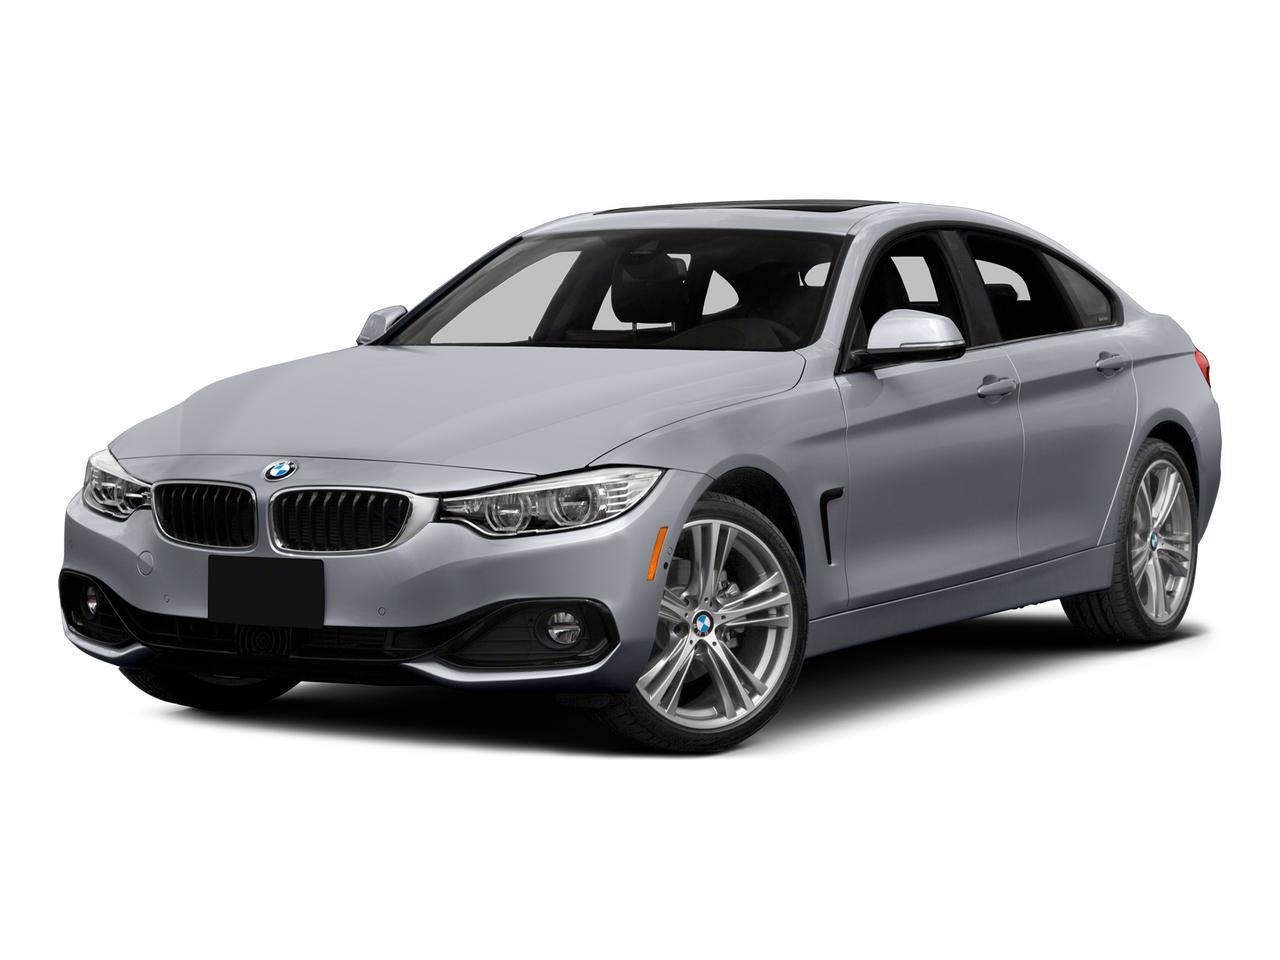 2015 BMW 428i Vehicle Photo in Edinburg, TX 78539